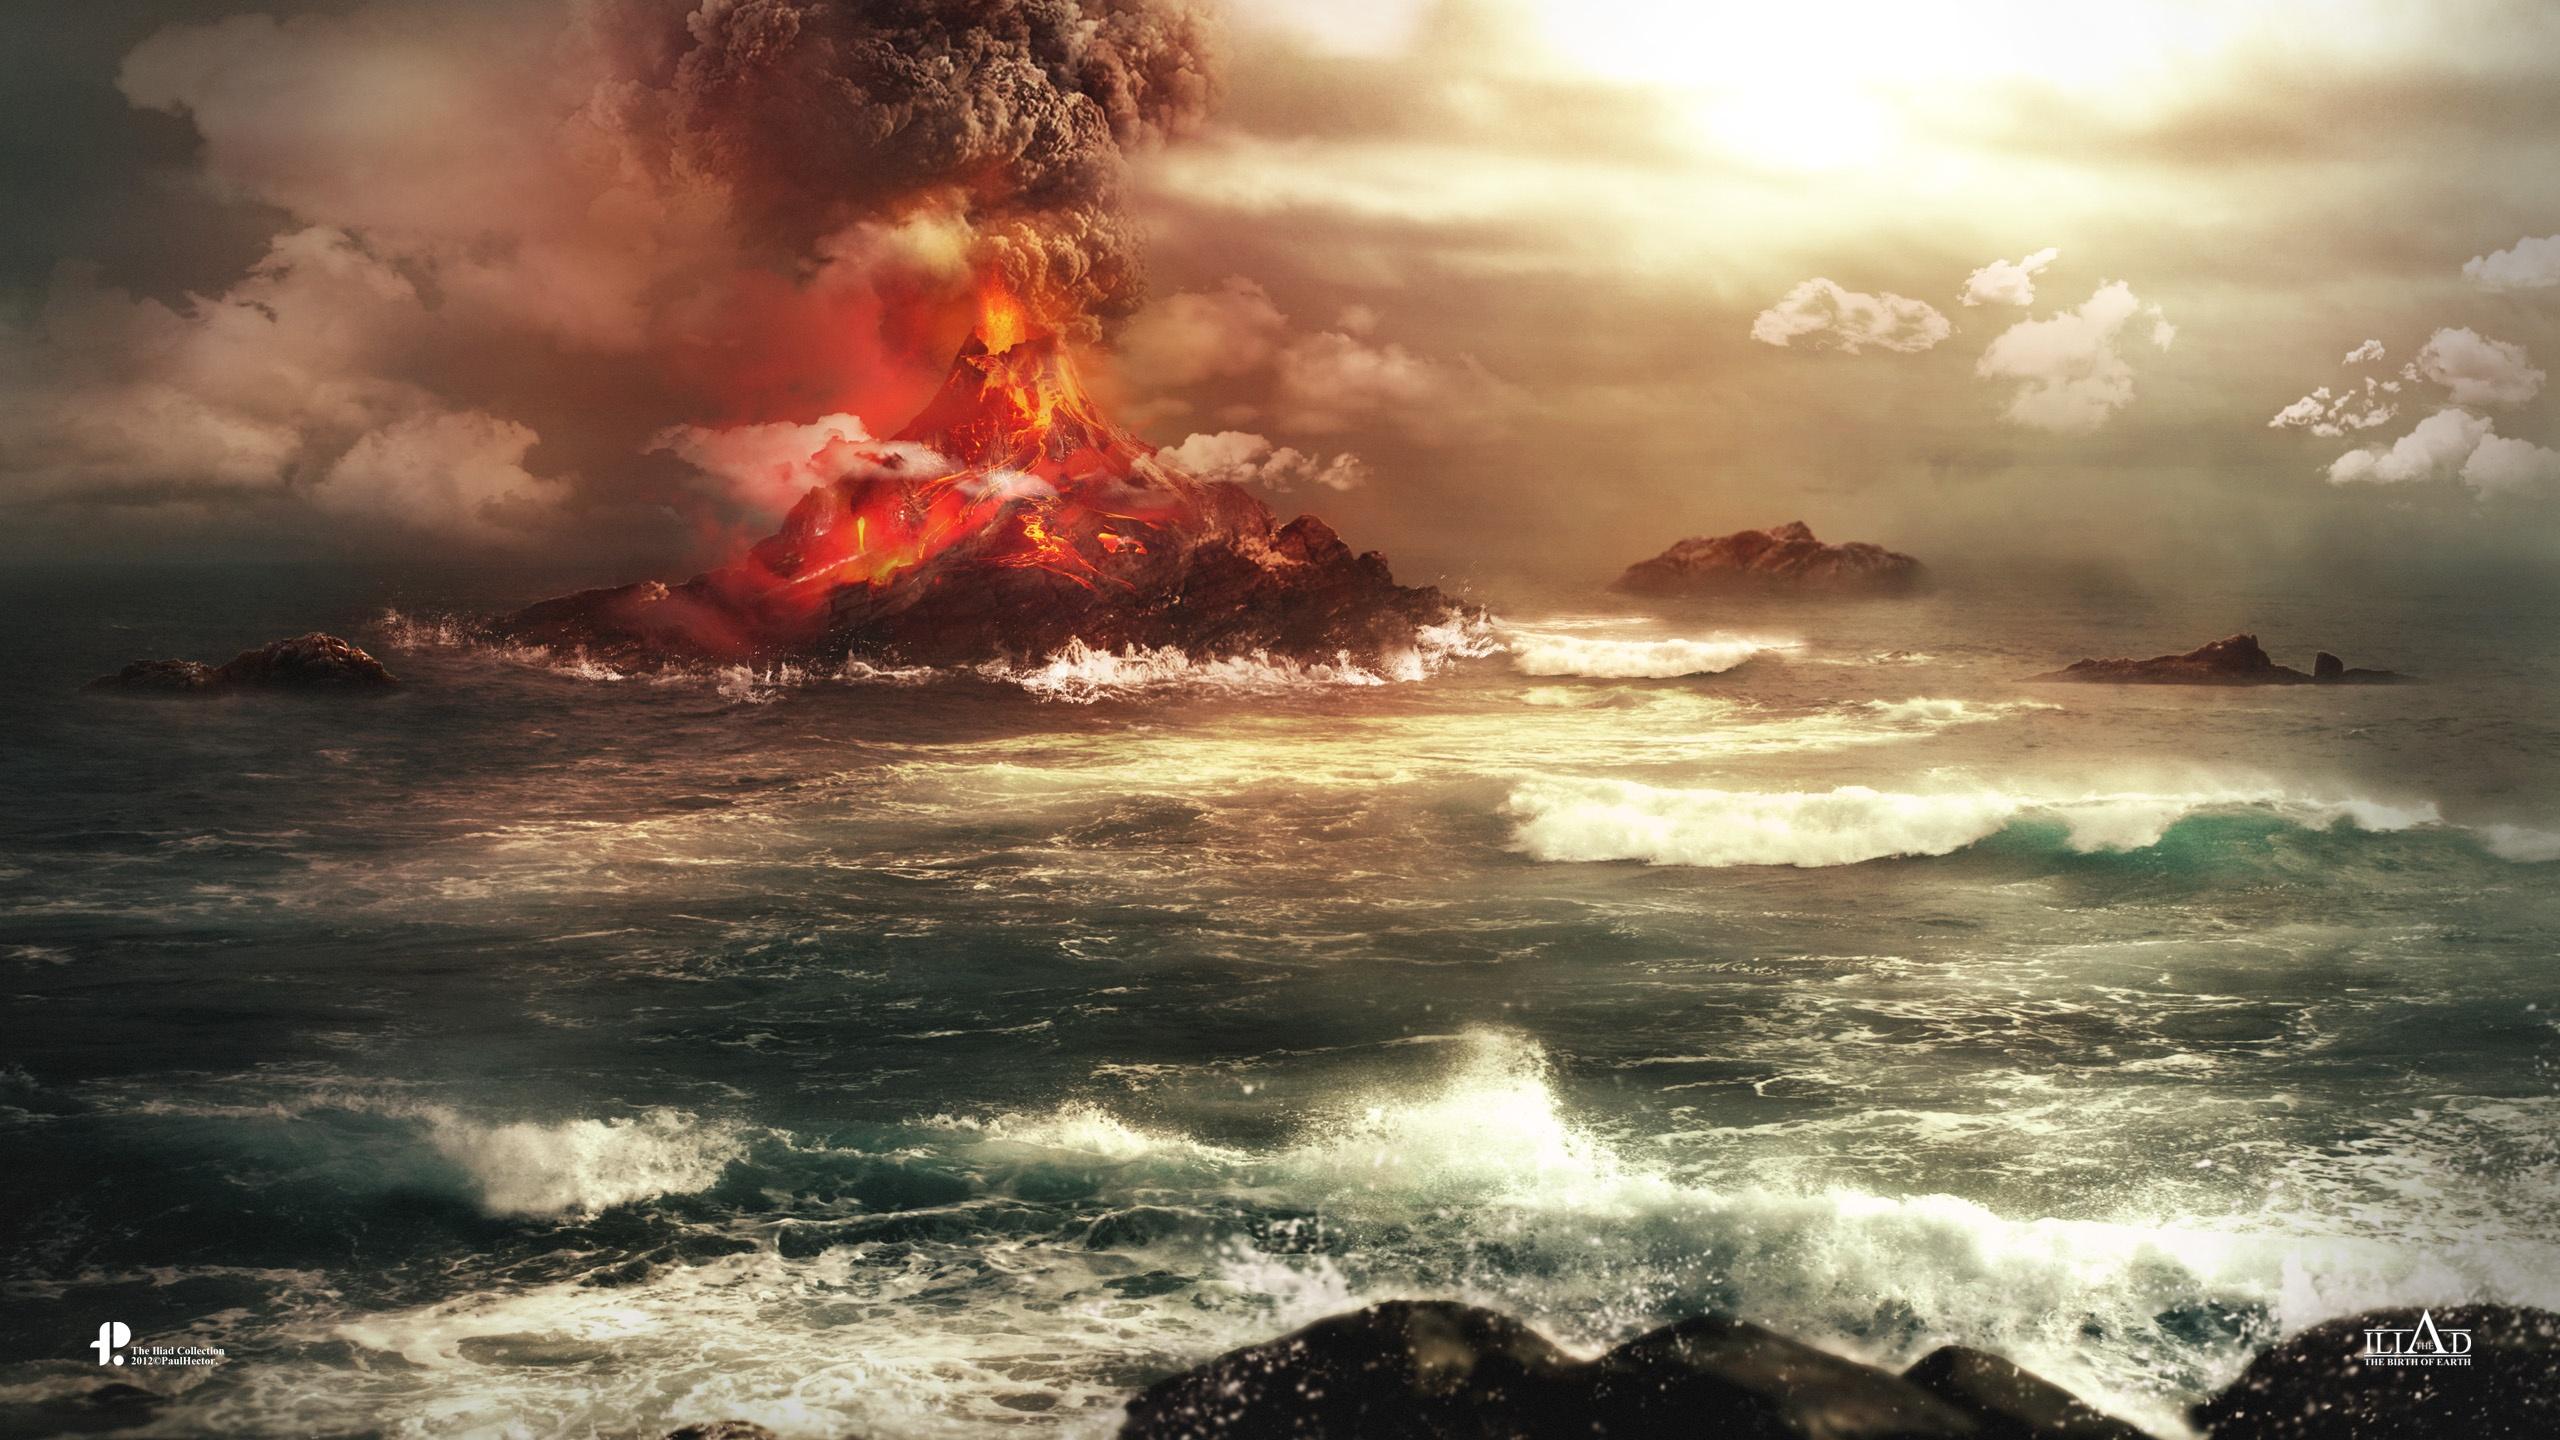 Volcano Wallpapers HD Wallpapers 2560x1440